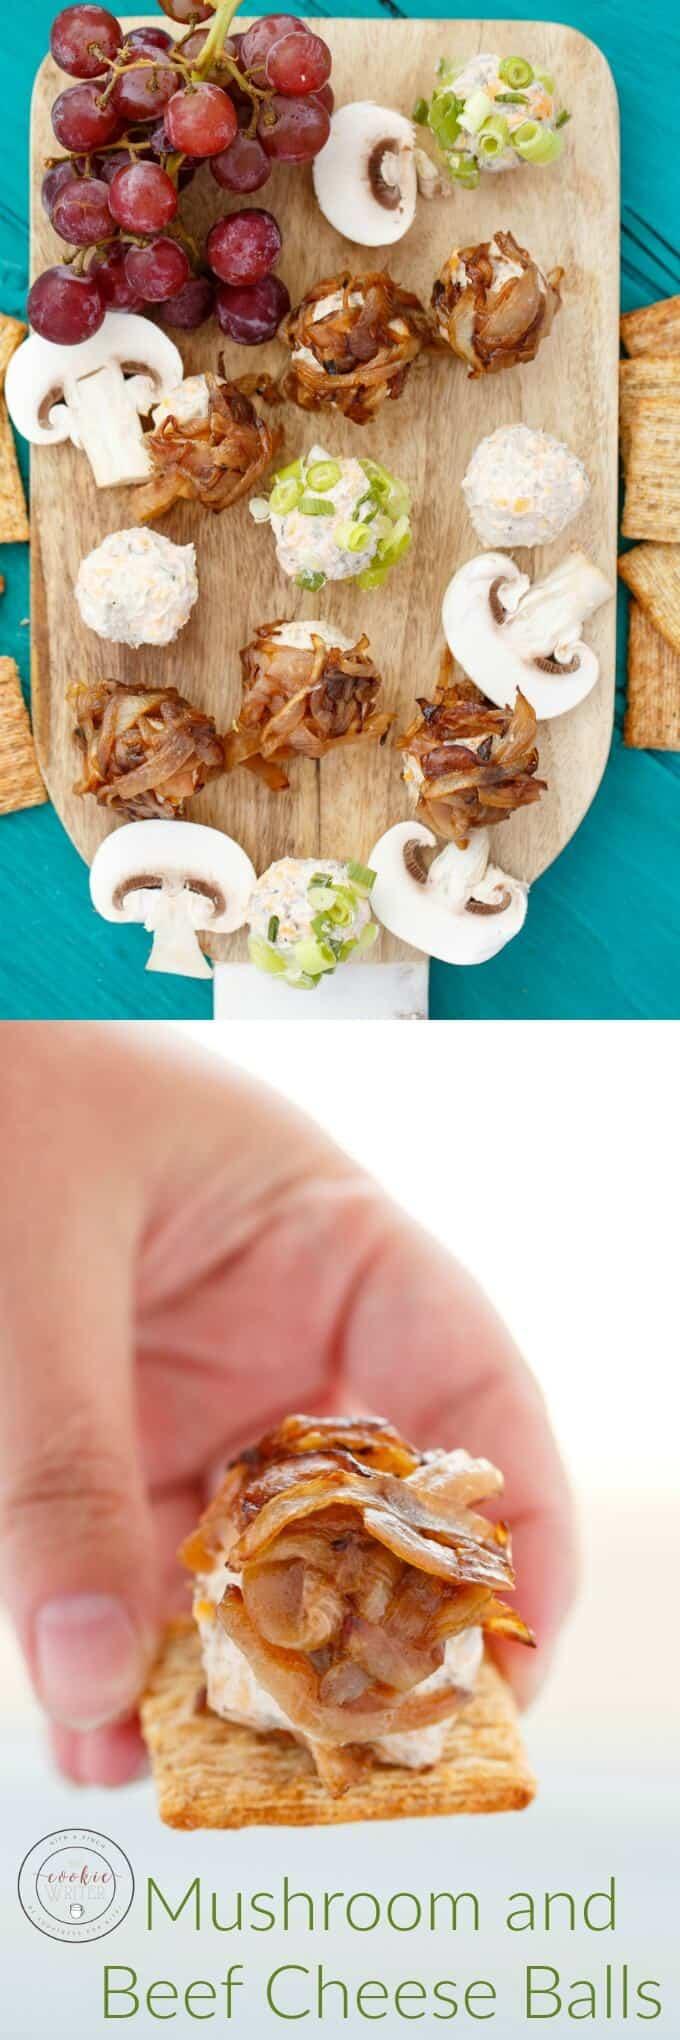 Mushroom and Beef Cheese Balls (Mini Style!)